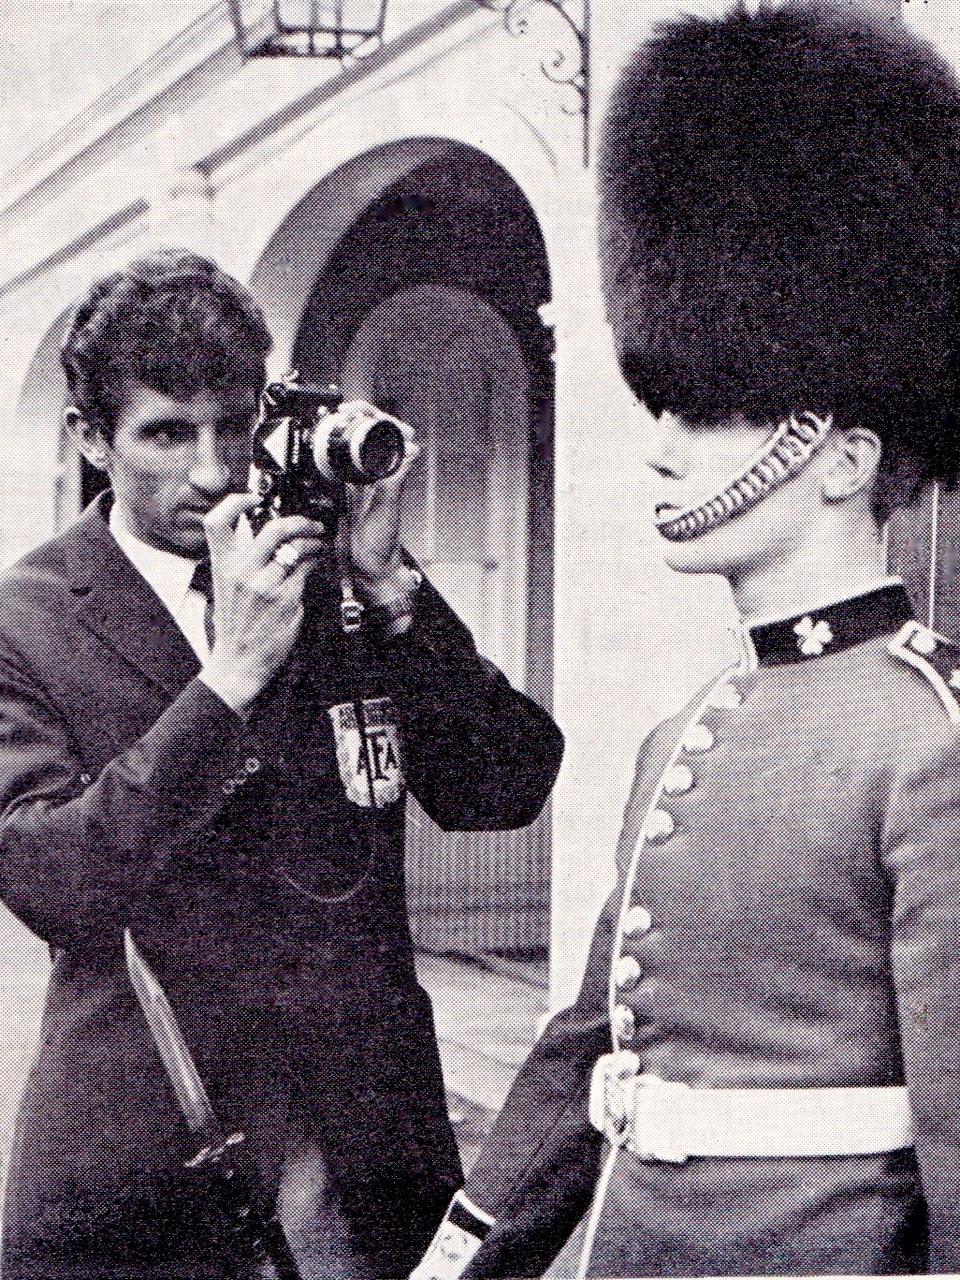 Antonio Rattin in England, 1966